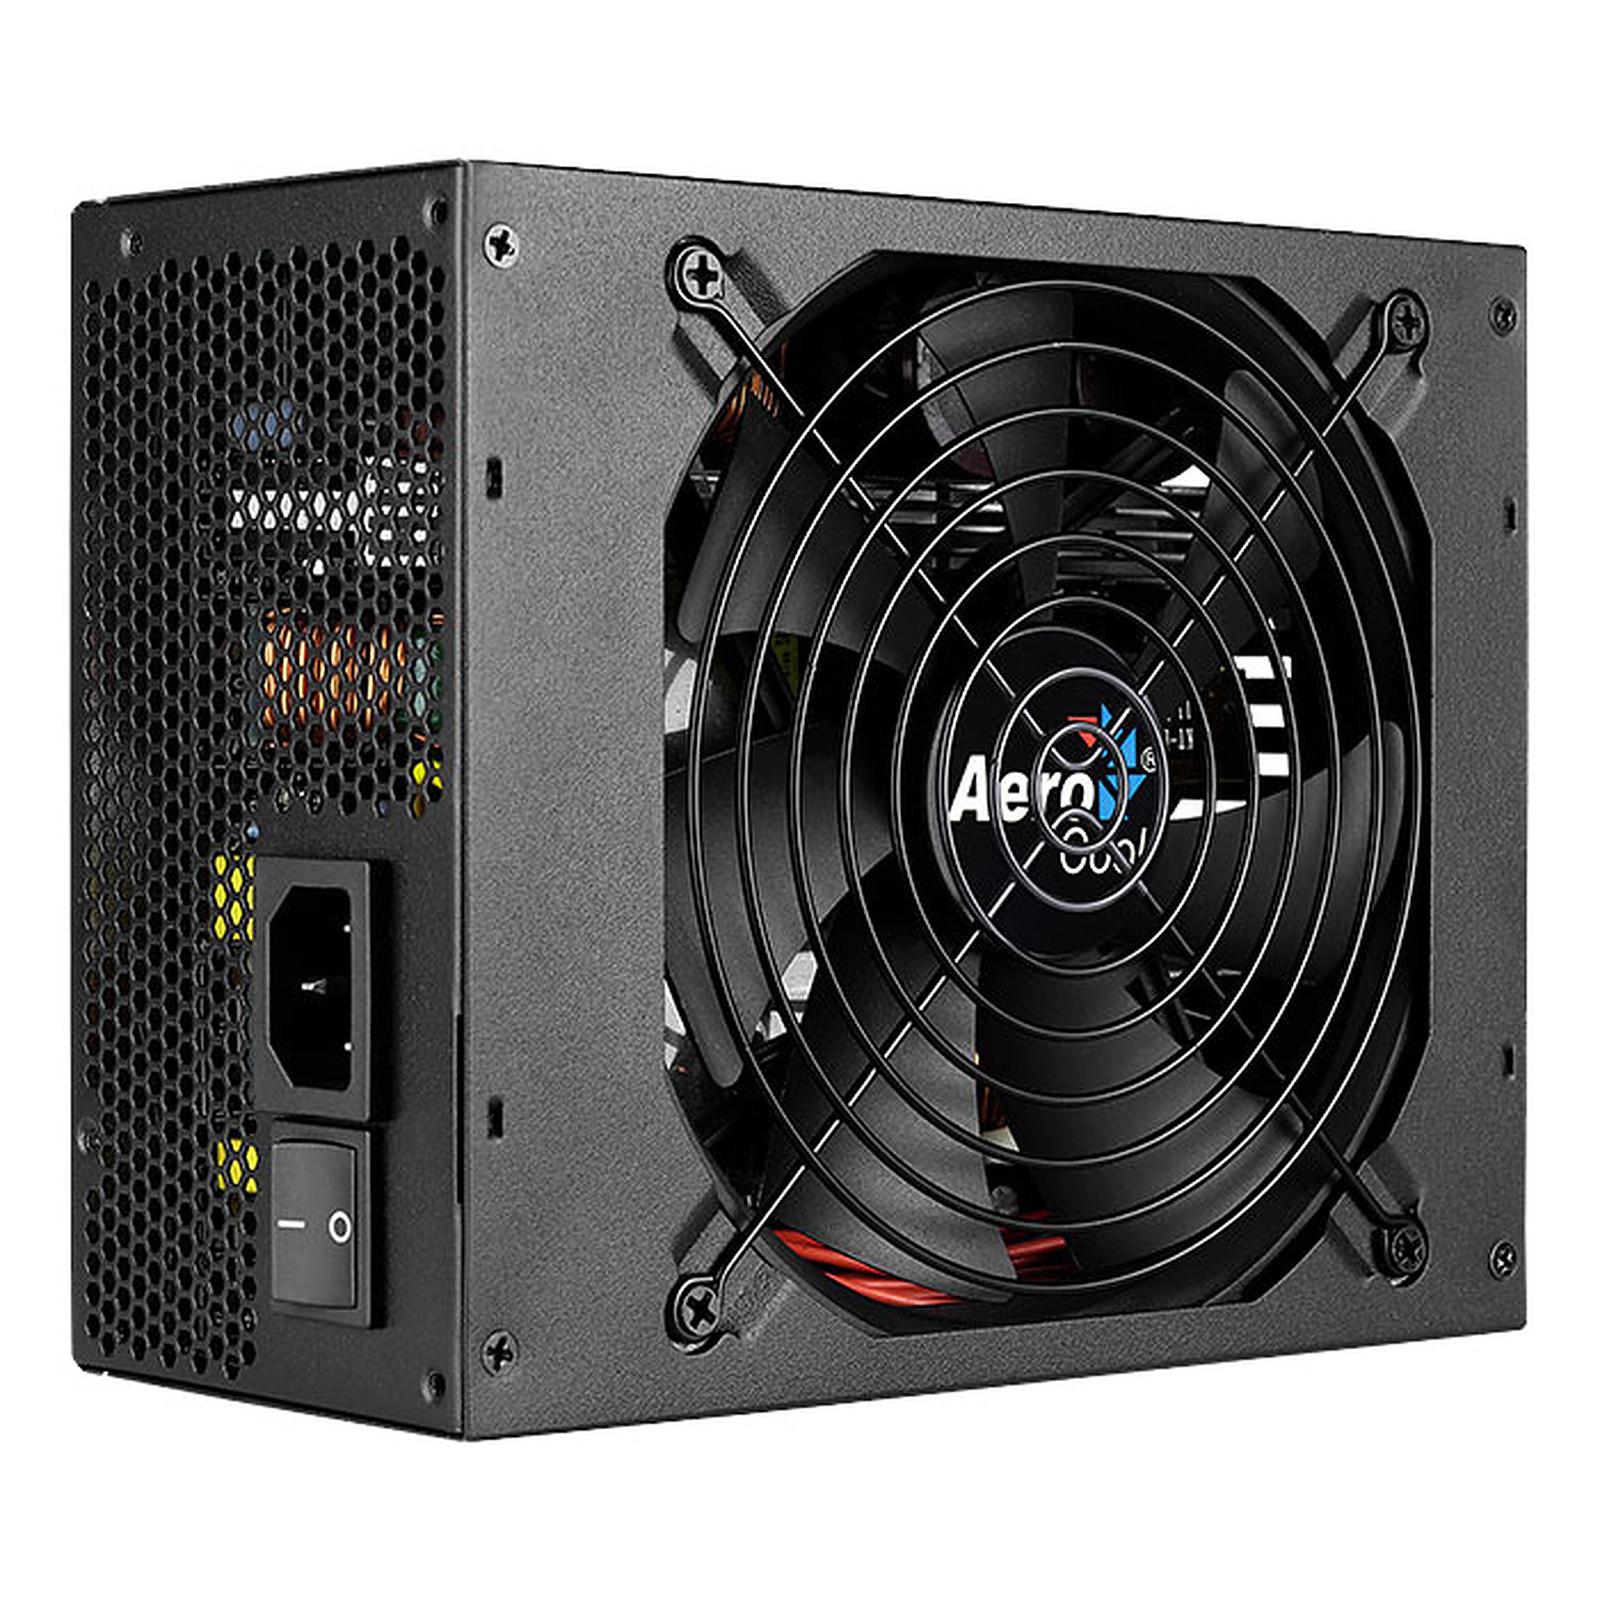 Aerocool ACPS-1800W ATX